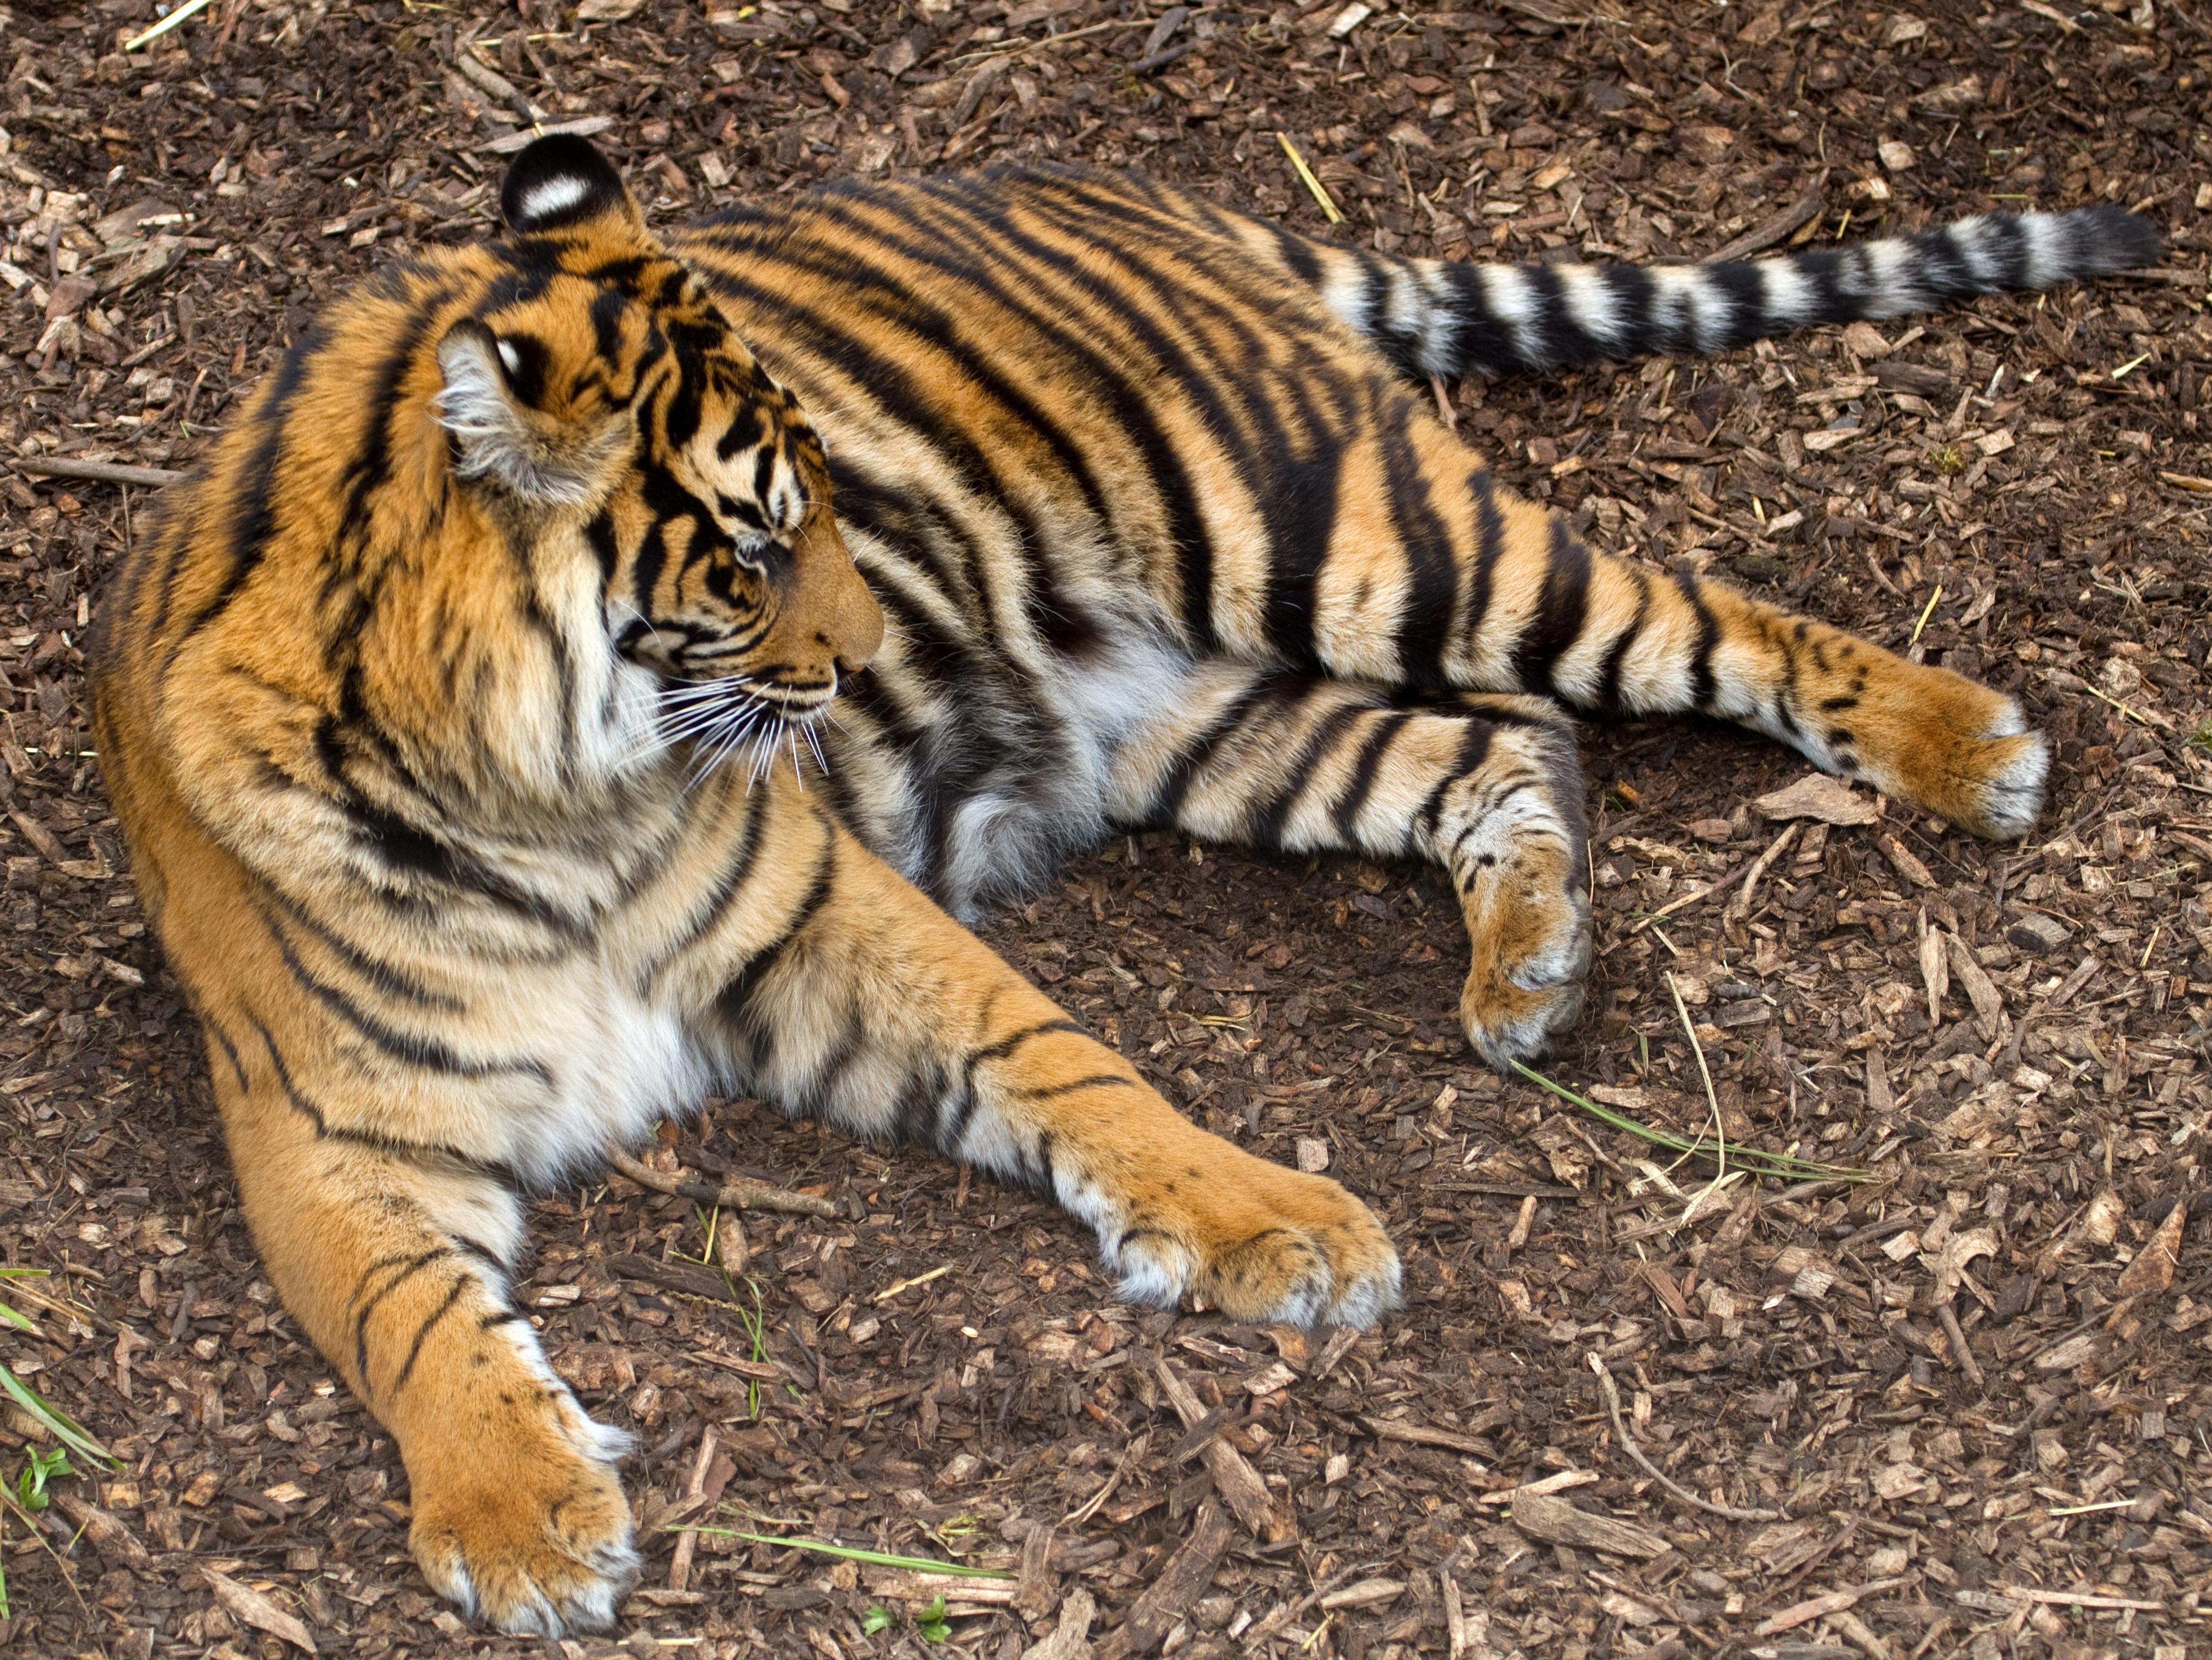 Sumatran tiger vs siberian tiger